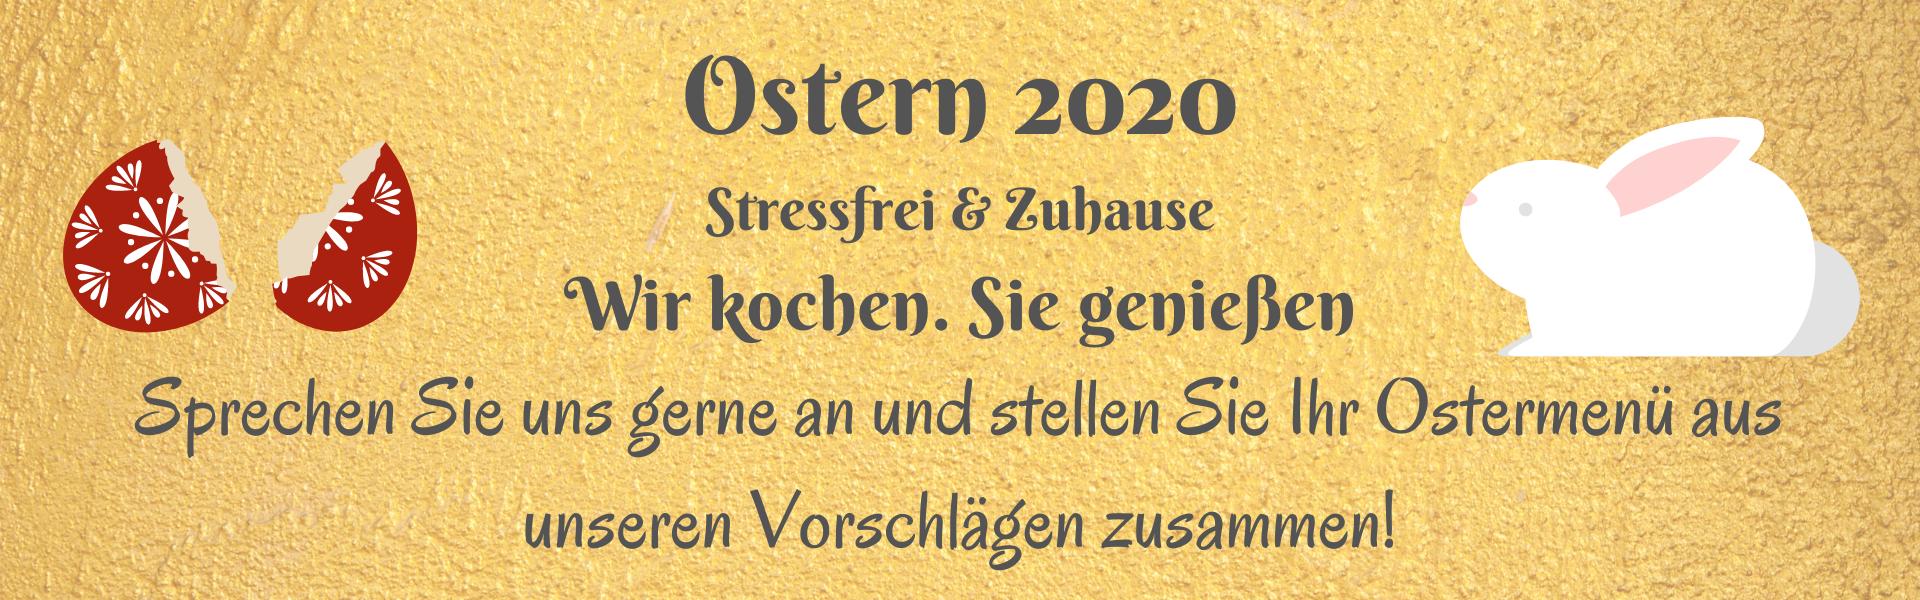 besonderes Ostermenü 2020 ristorante Lucchese ankum